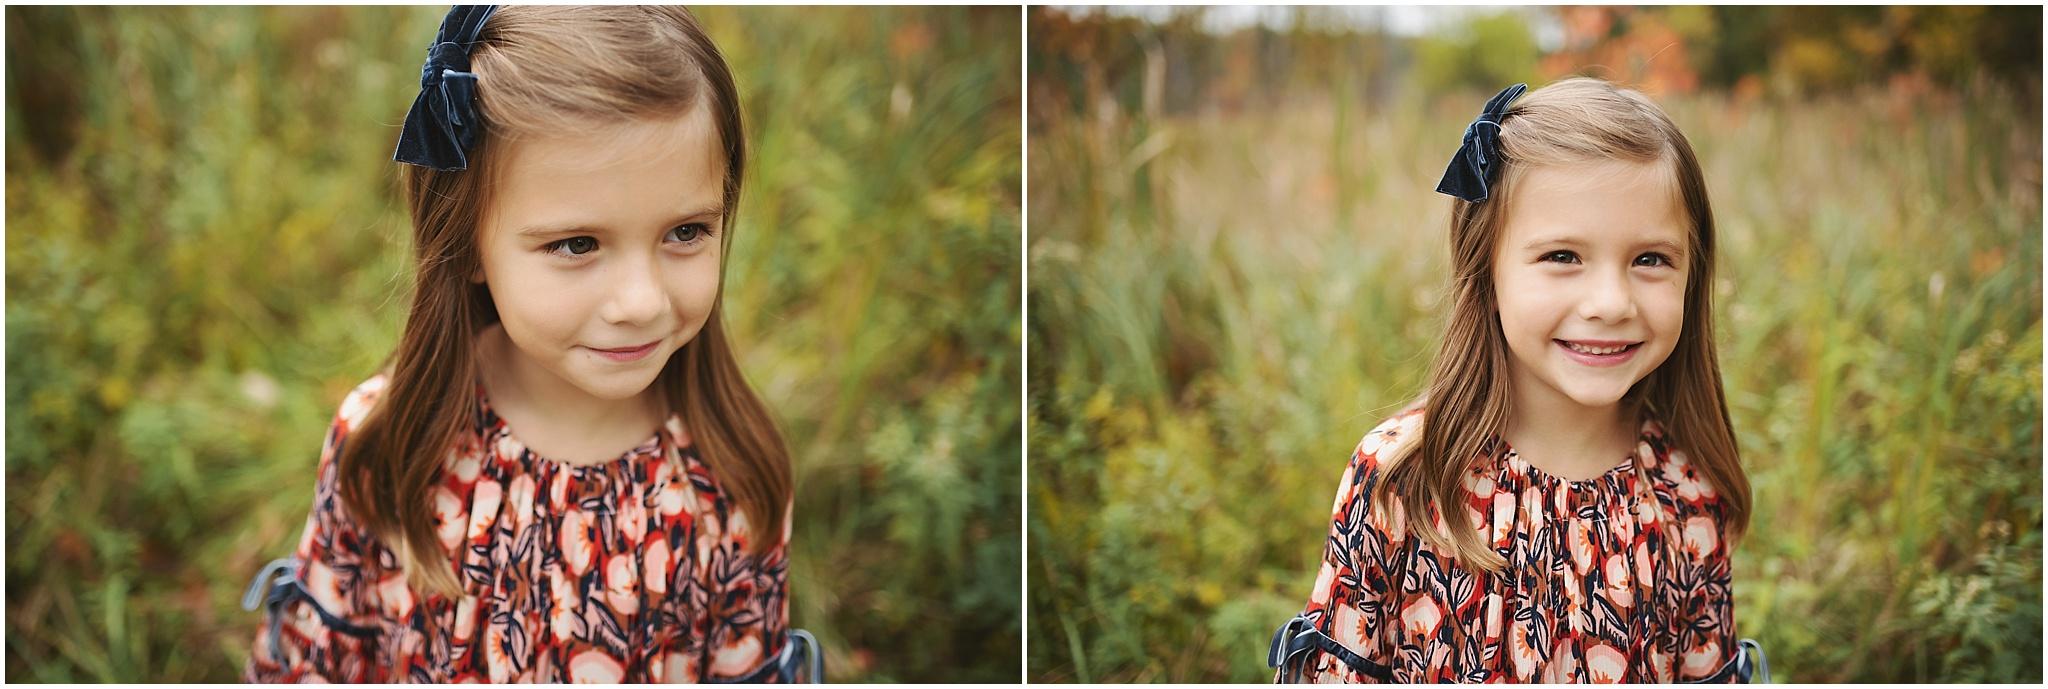 karra lynn photography - family photographer milford mi - portrait